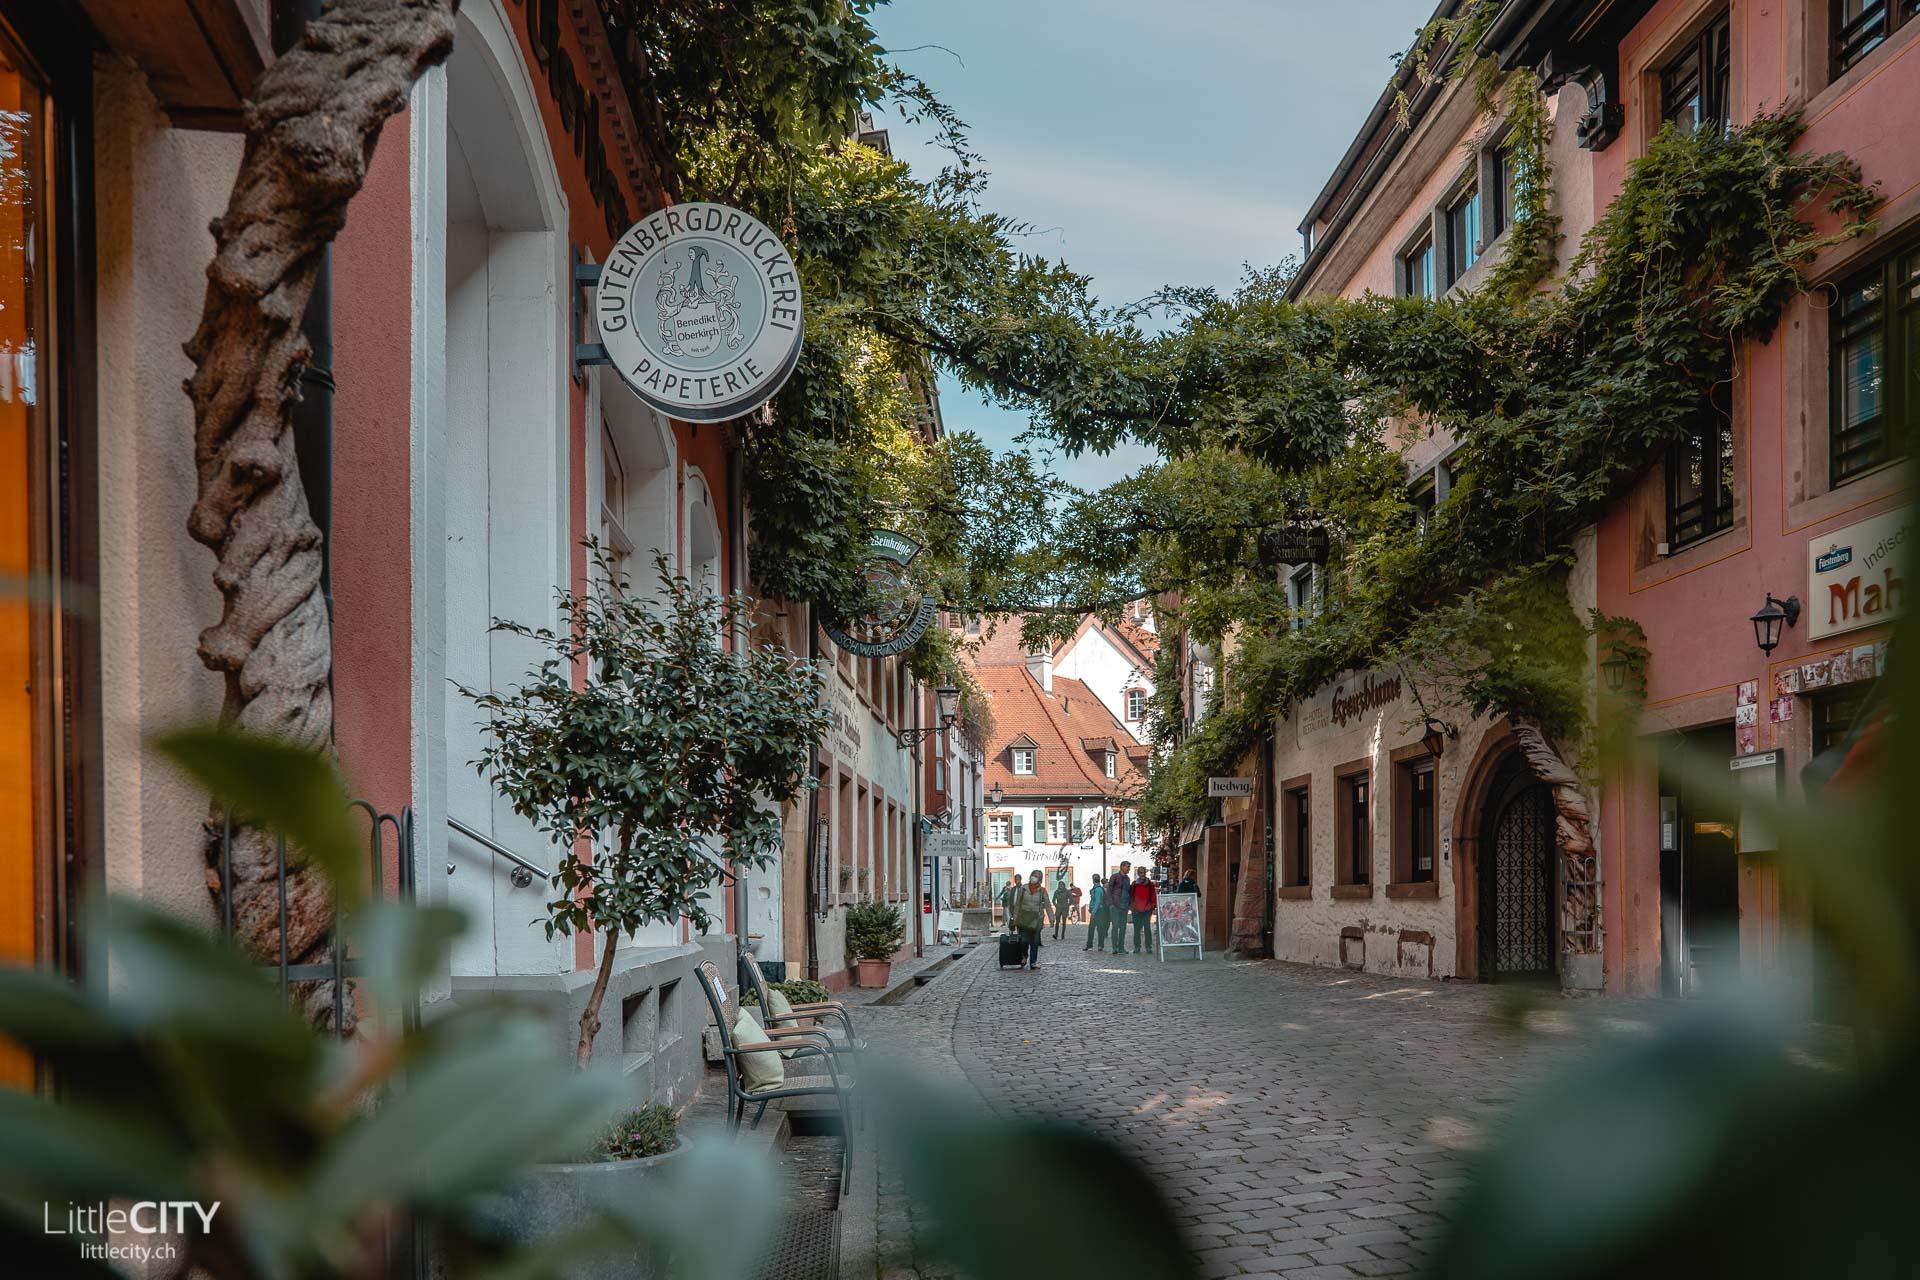 Konviktstrasse Freiburg im Breisgau Sehenswürdigkeit